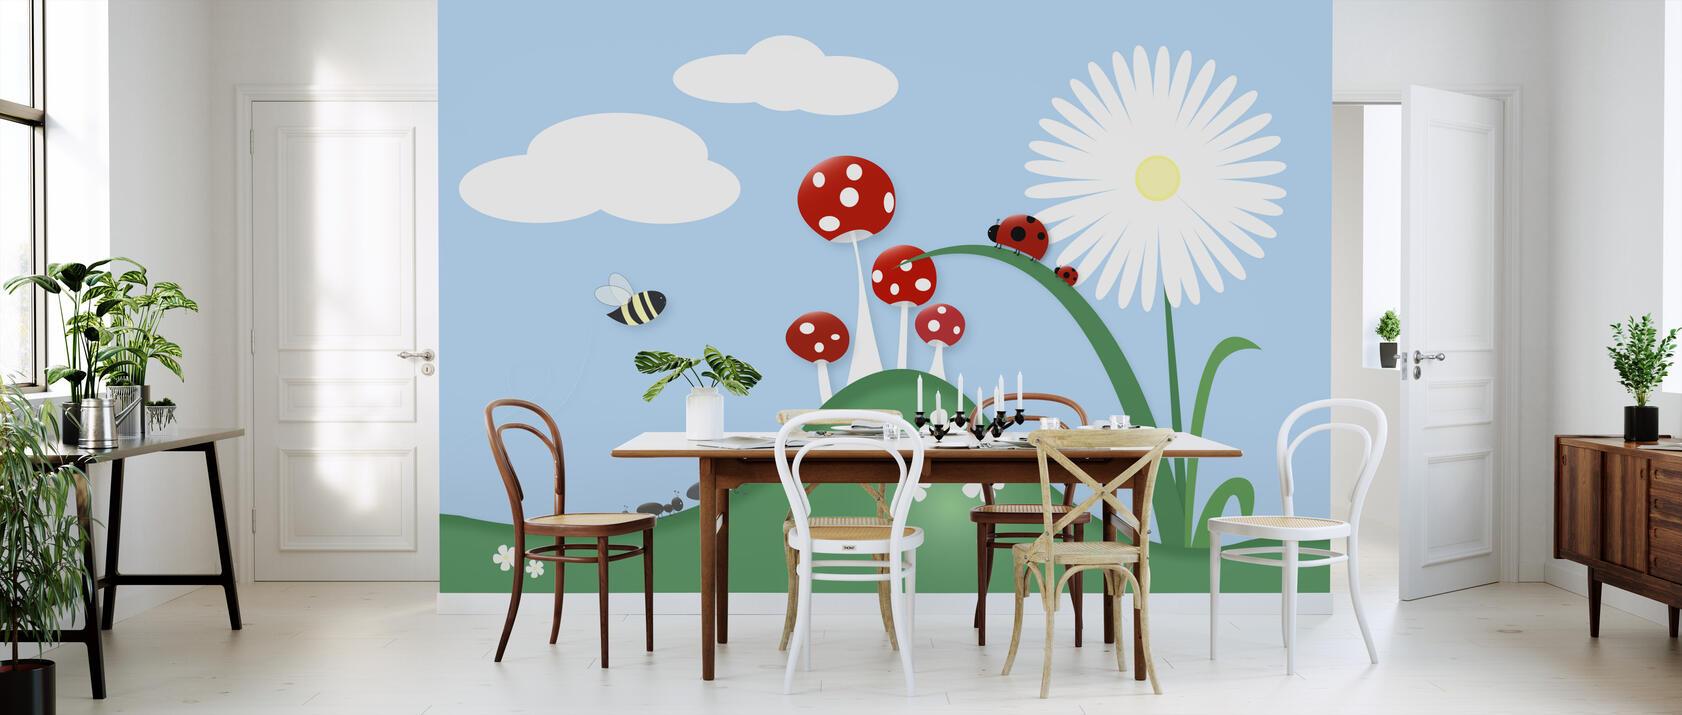 a bugs world kostenlos gelieferte fototapete von h chster qualit t photowall. Black Bedroom Furniture Sets. Home Design Ideas